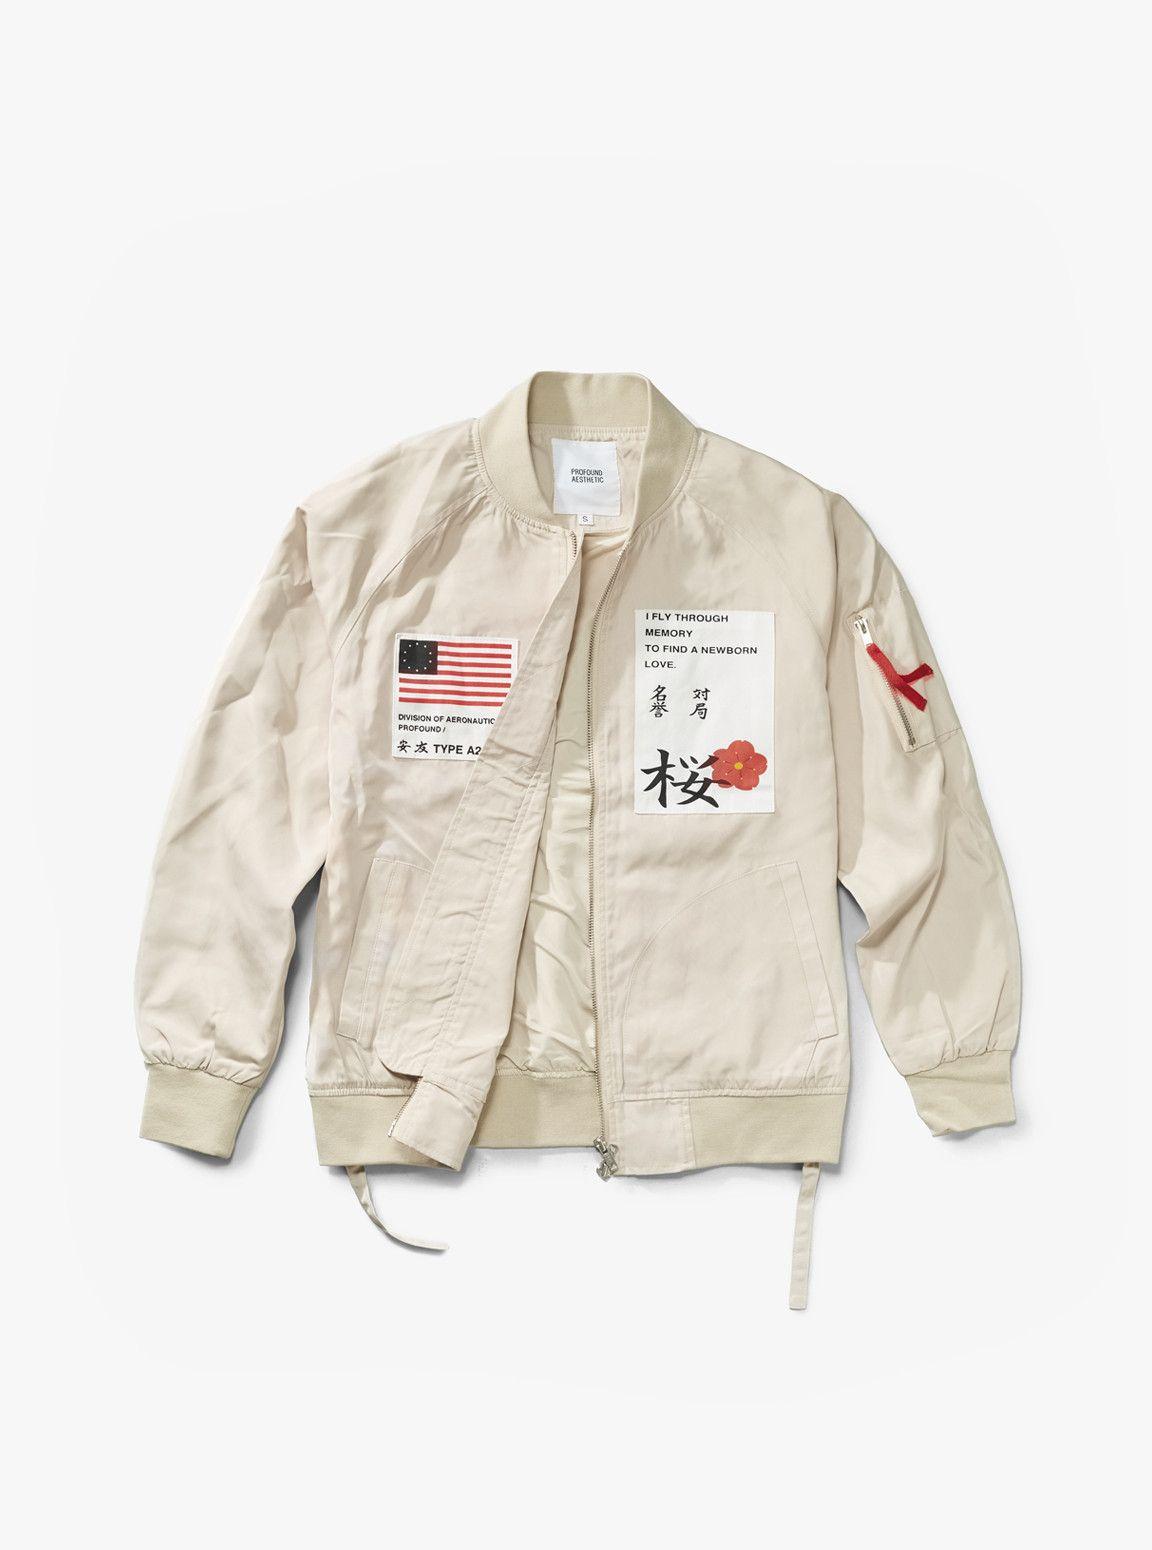 Something Similar To This Sold Out Profound Bomber Jackets Men Street Flight Jacket Light Jacket Summer [ 1550 x 1152 Pixel ]